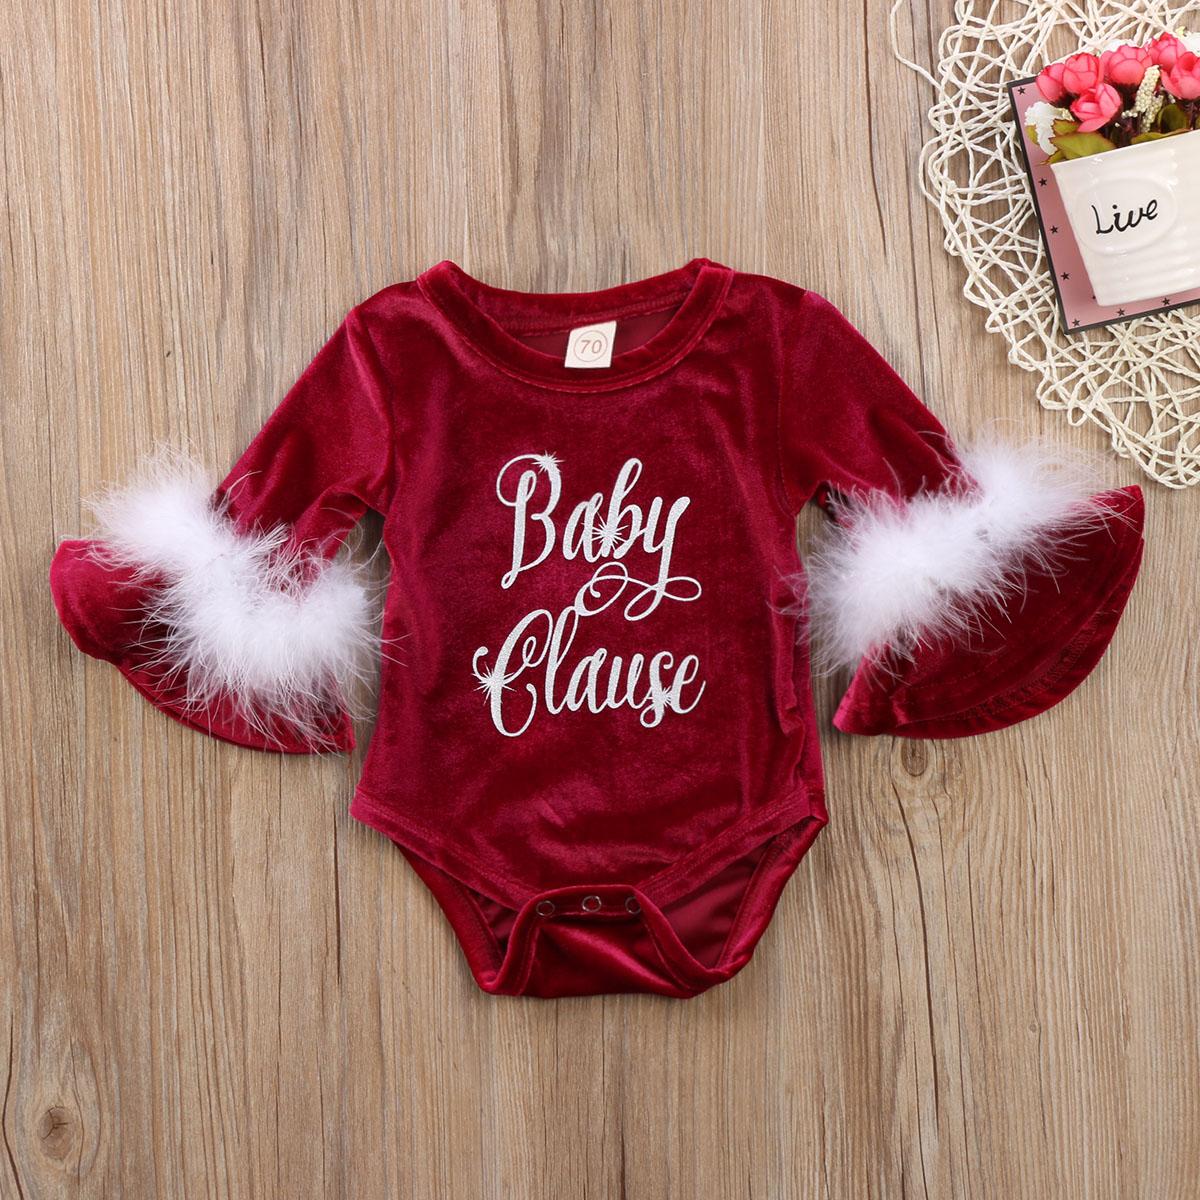 HTB10bDmc3vD8KJjSsplq6yIEFXaC Pudcoco 2017 New Pleuche Christmas Baby Girls Romper long sleeves infant newborn baby jumpsuit princess plush clothes xmas gift